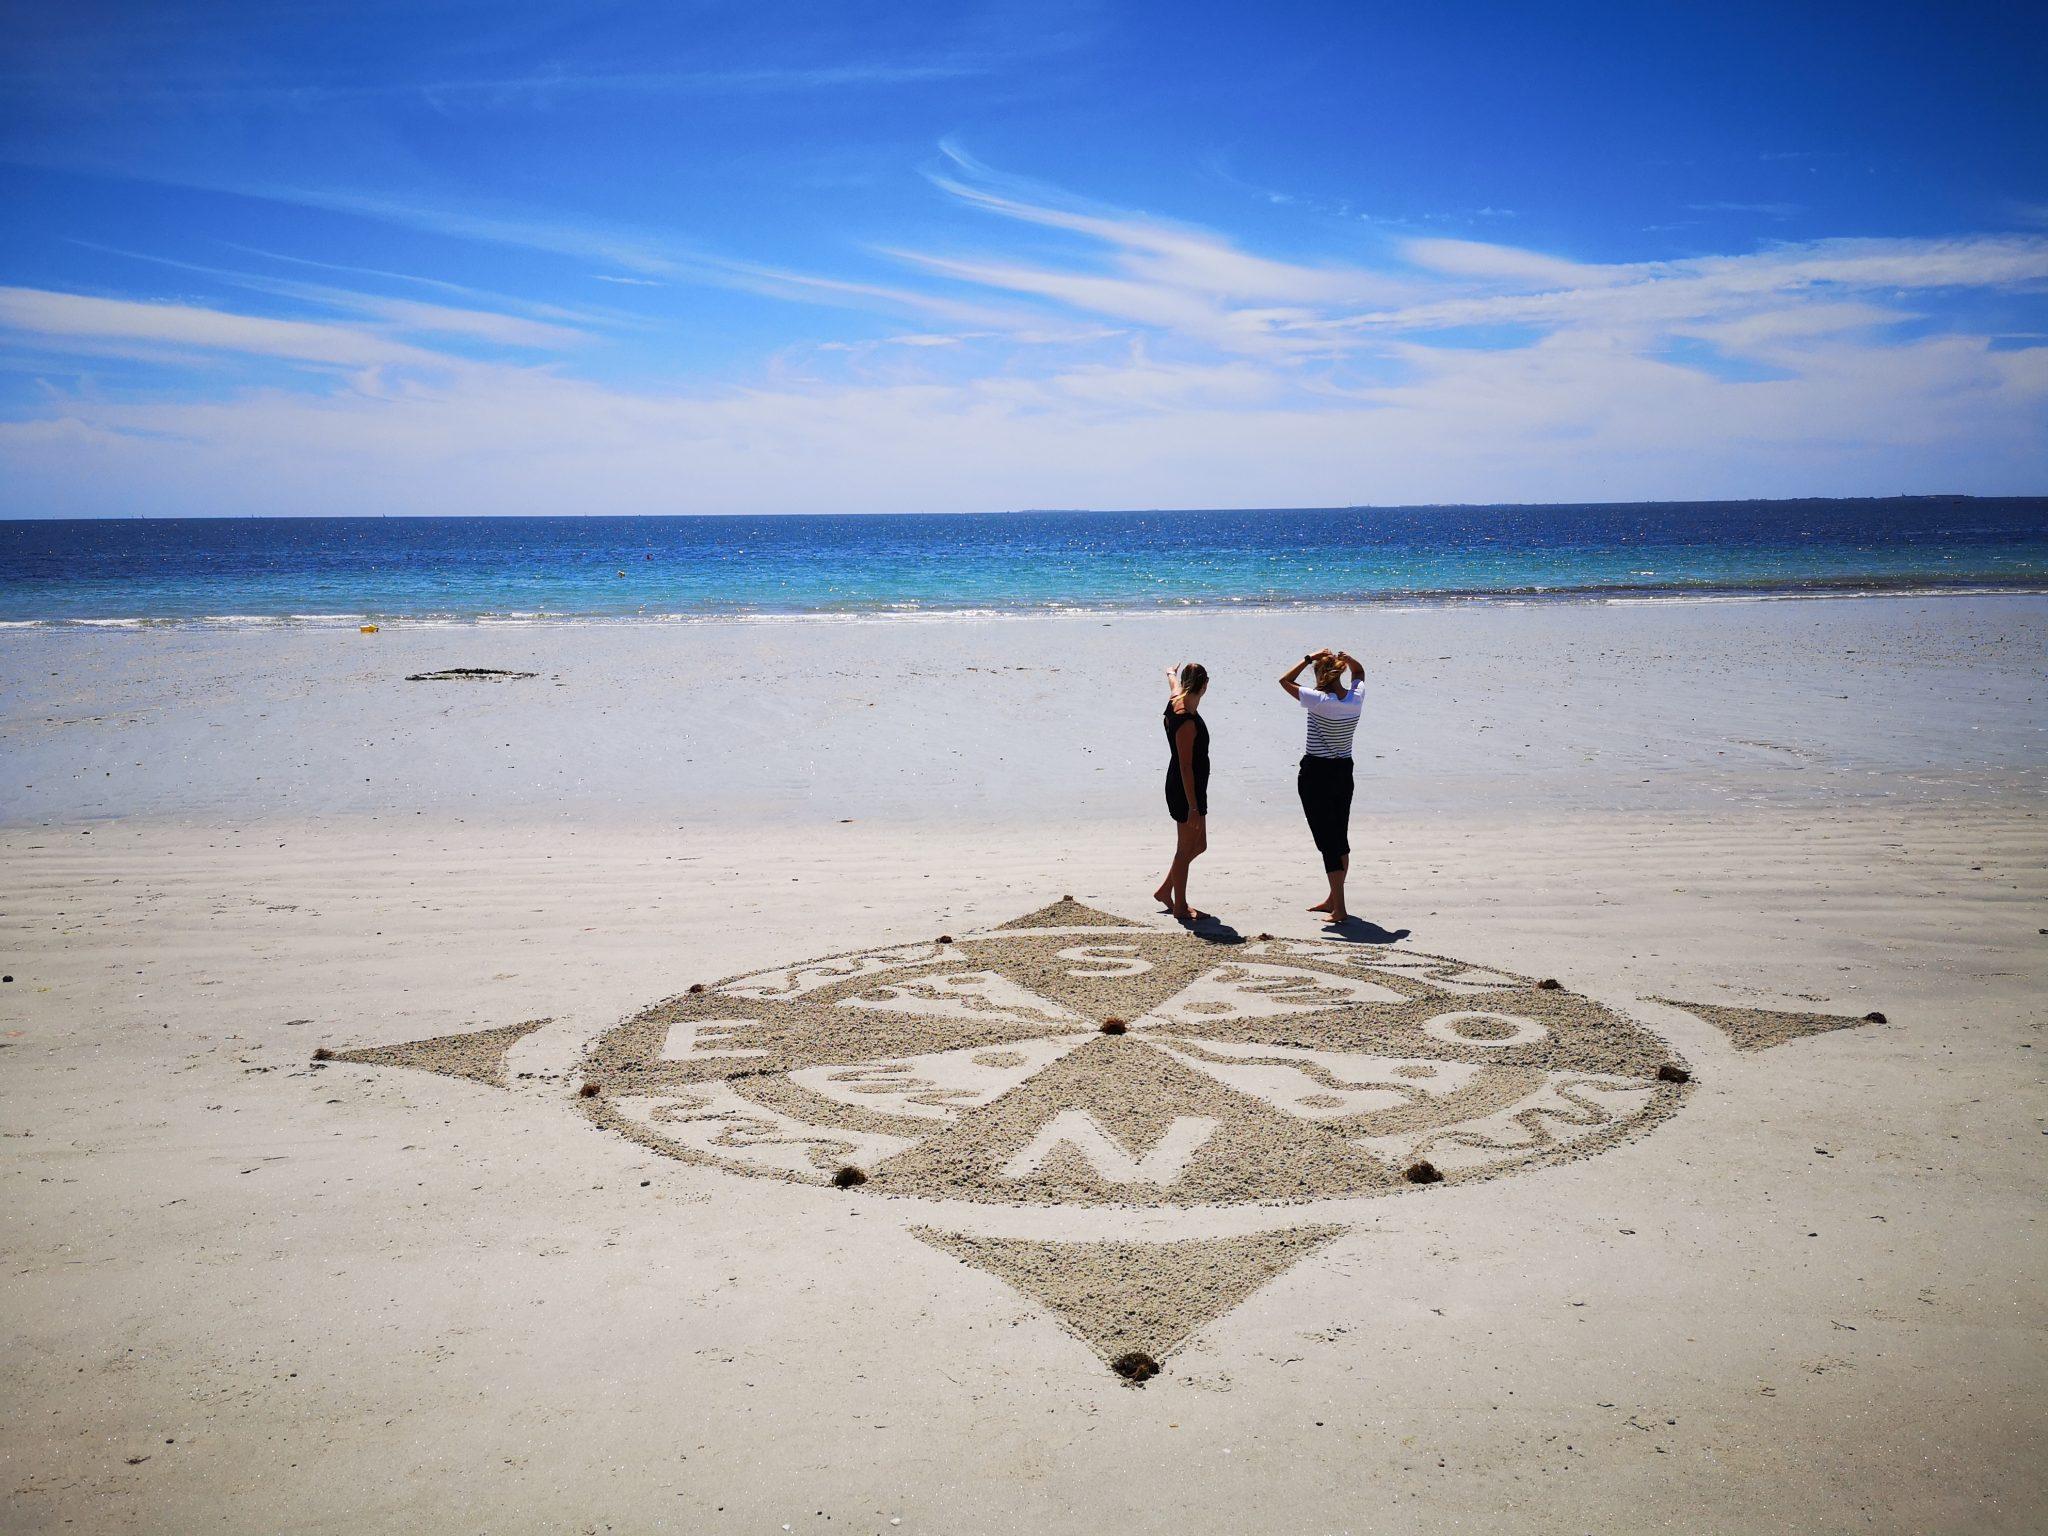 Beach Art à Fouesnant